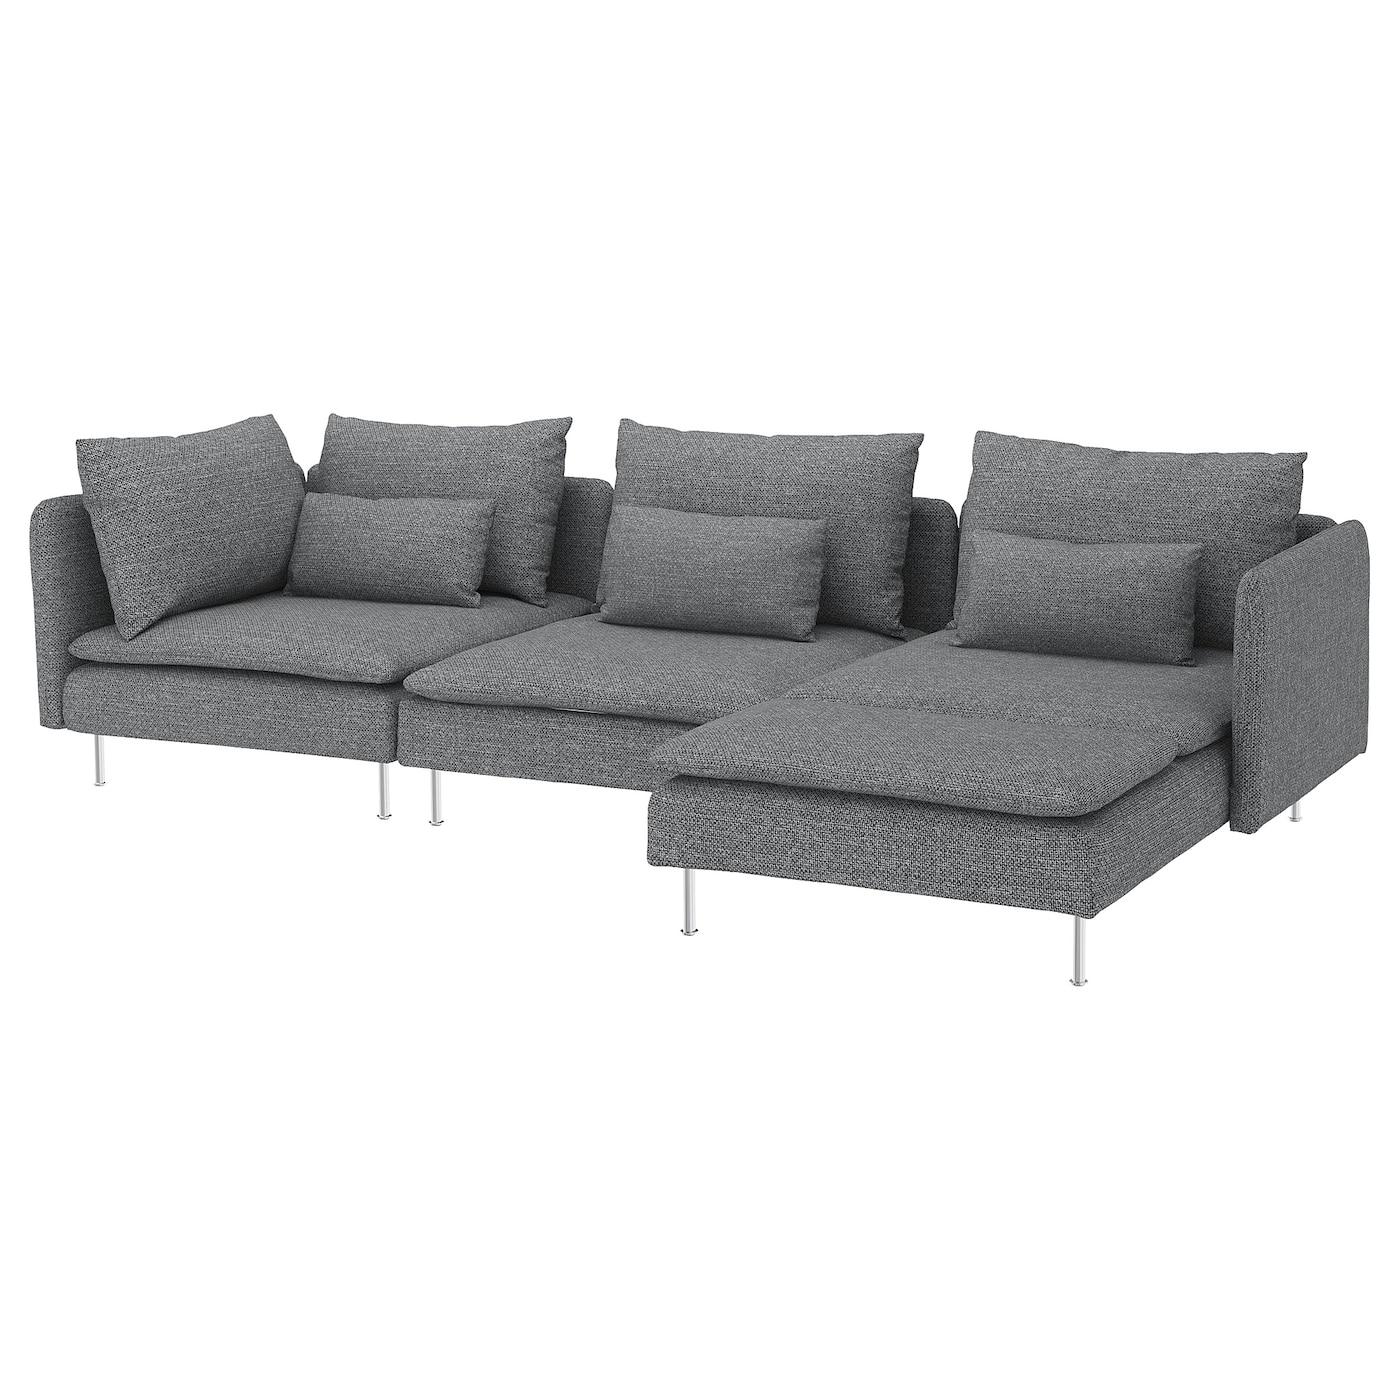 4er-Sofa SÖDERHAMN mit Récamiere, Lejde grau/schwarz